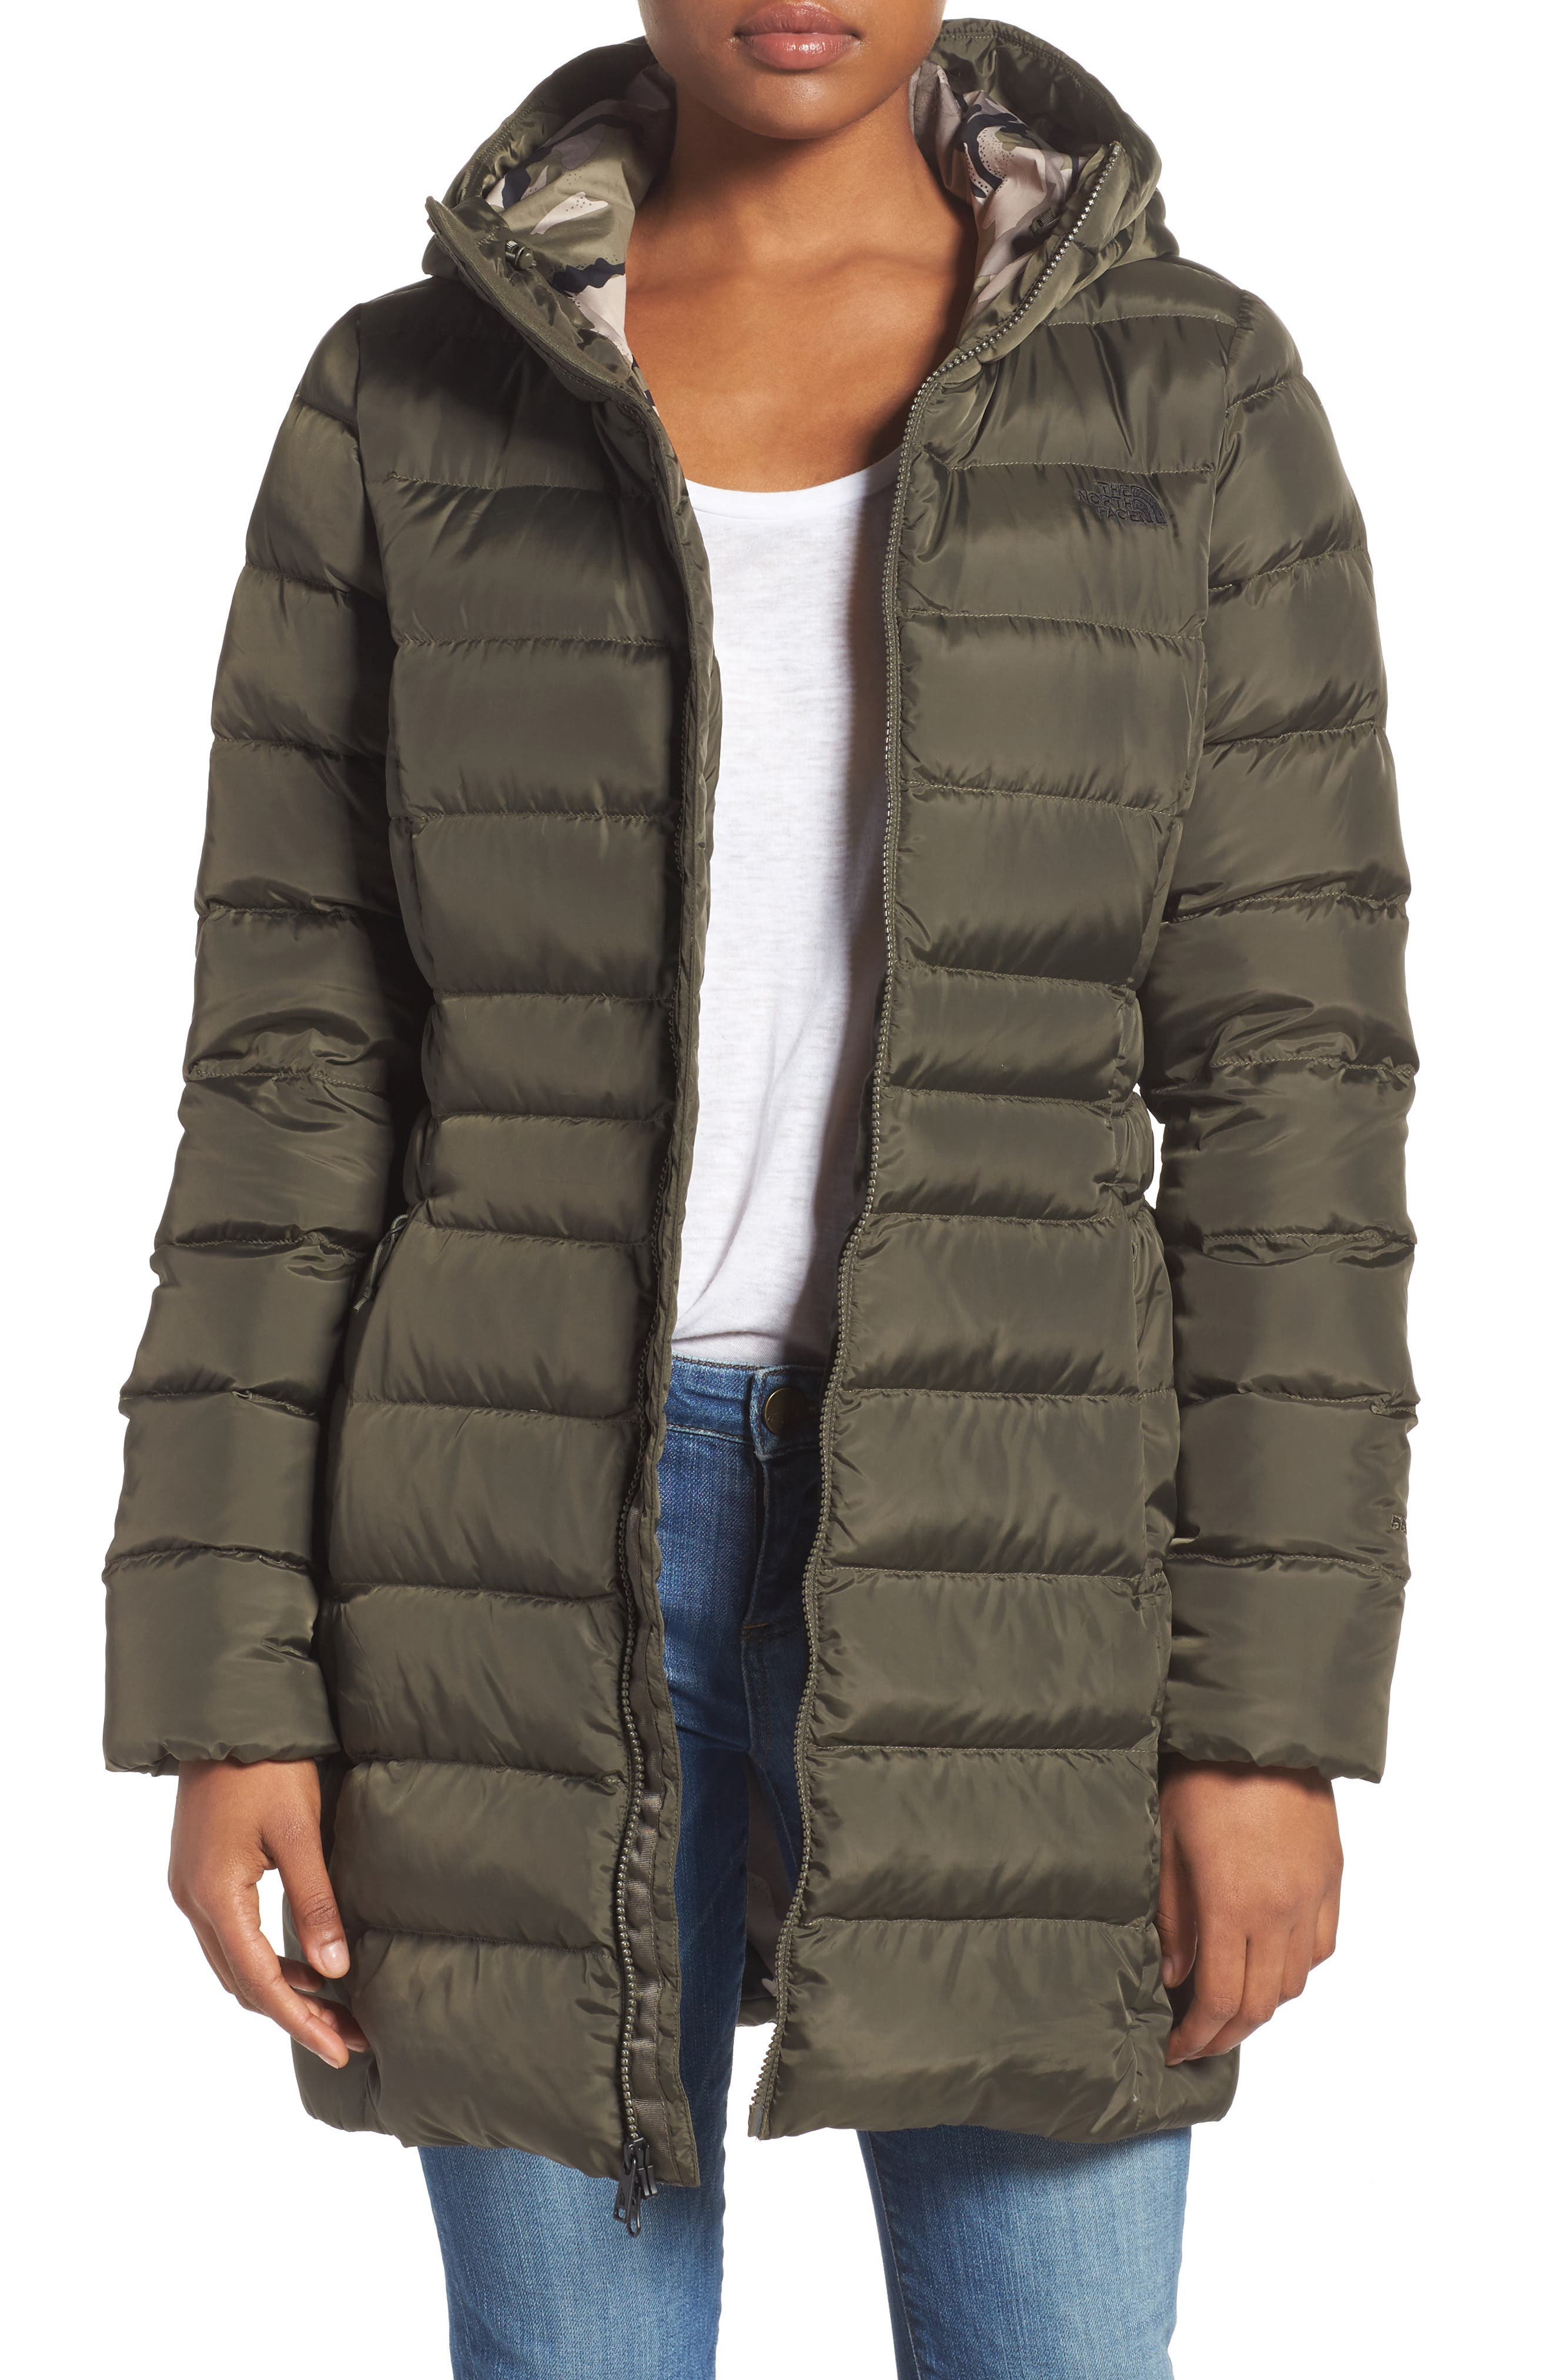 Oneill womens down jacket